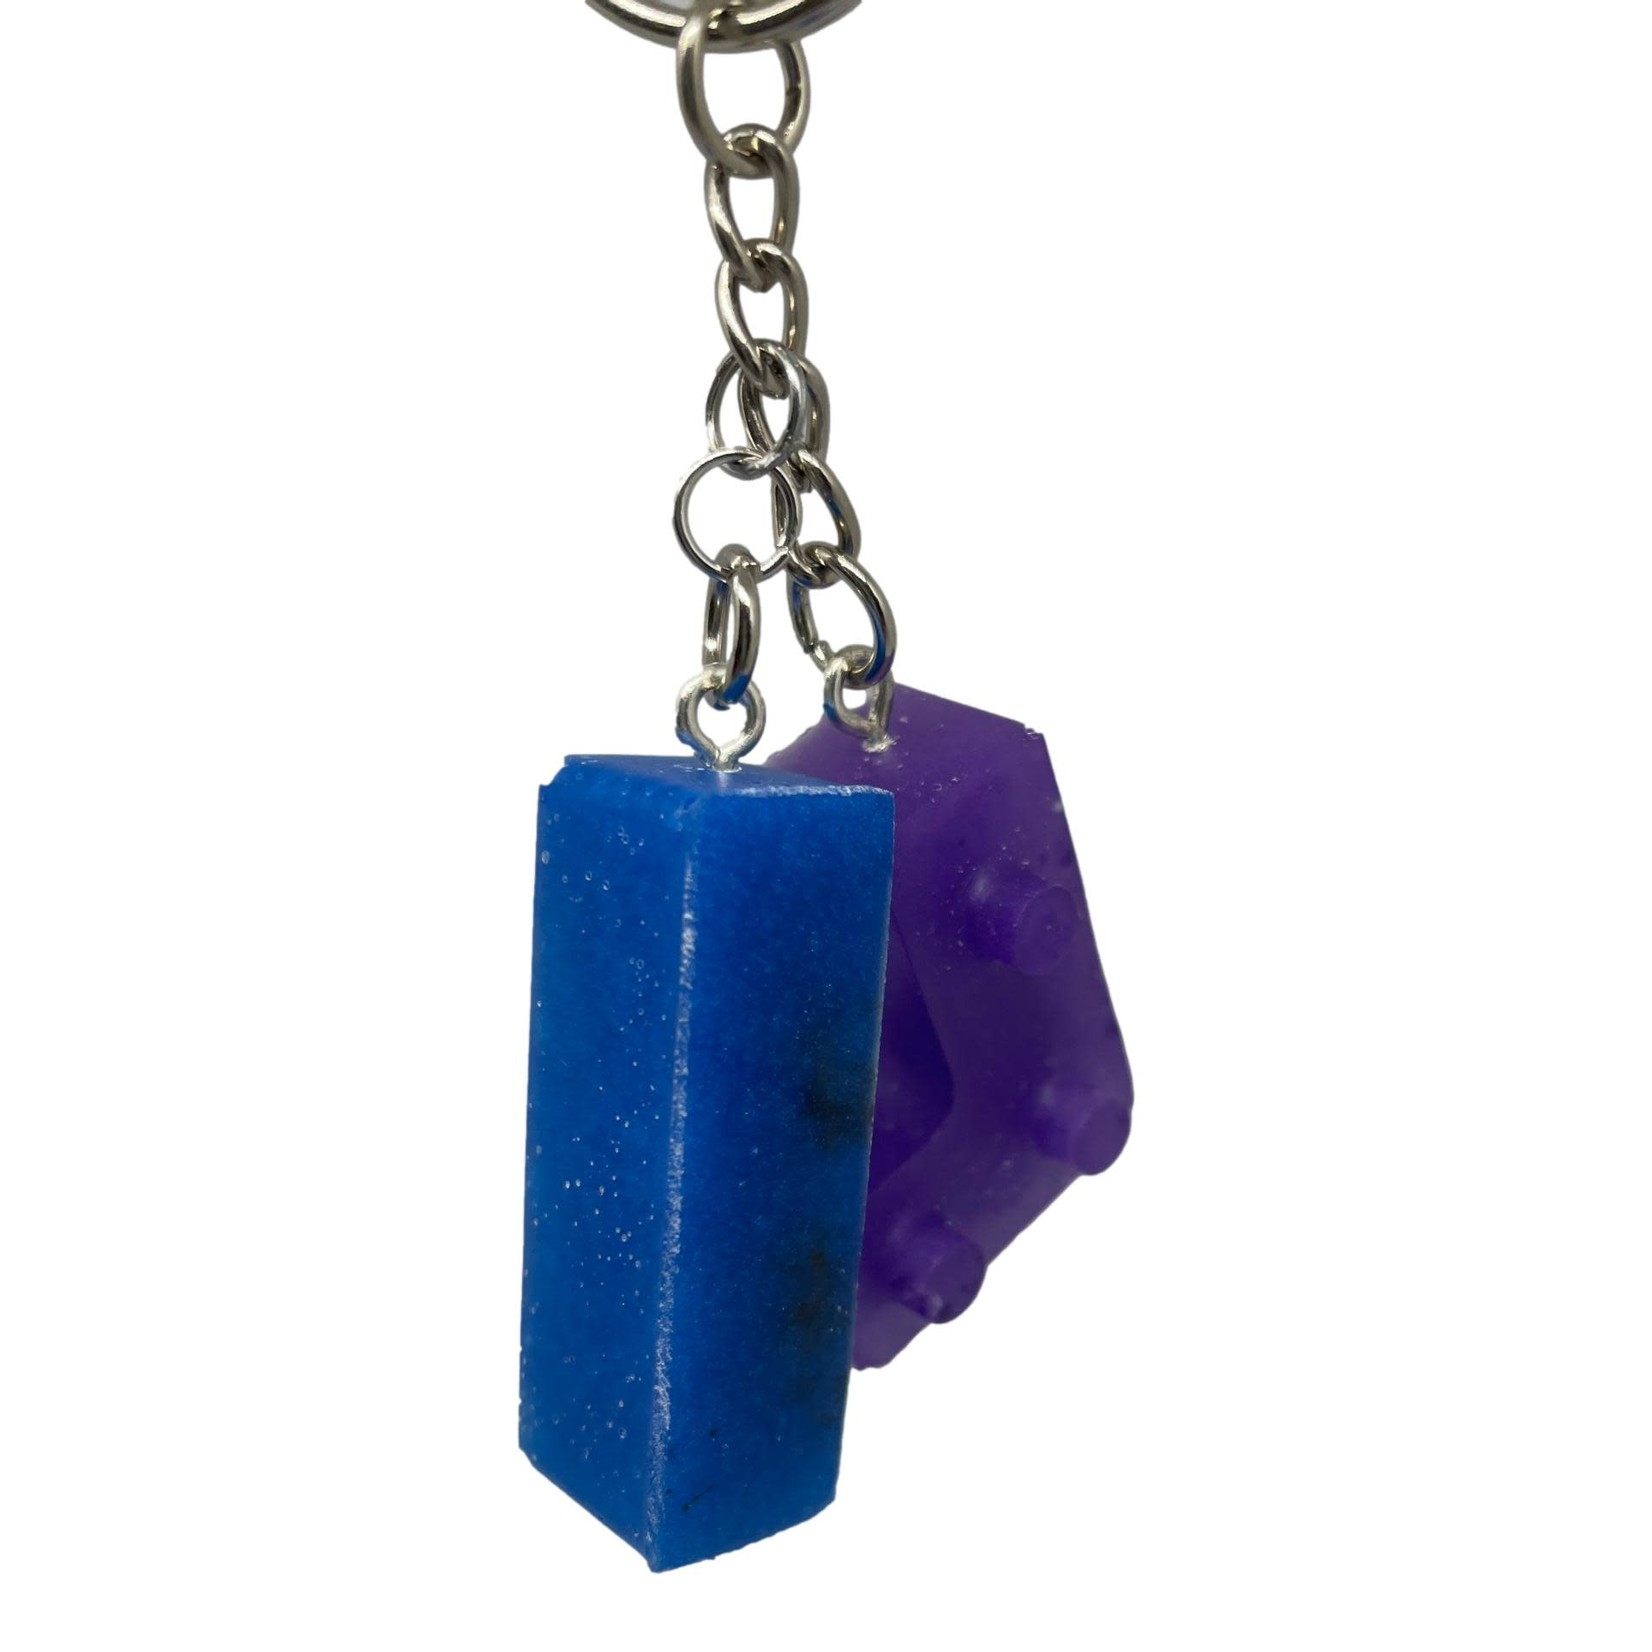 East Coast Sirens Purple & Blue Lego Key Chain